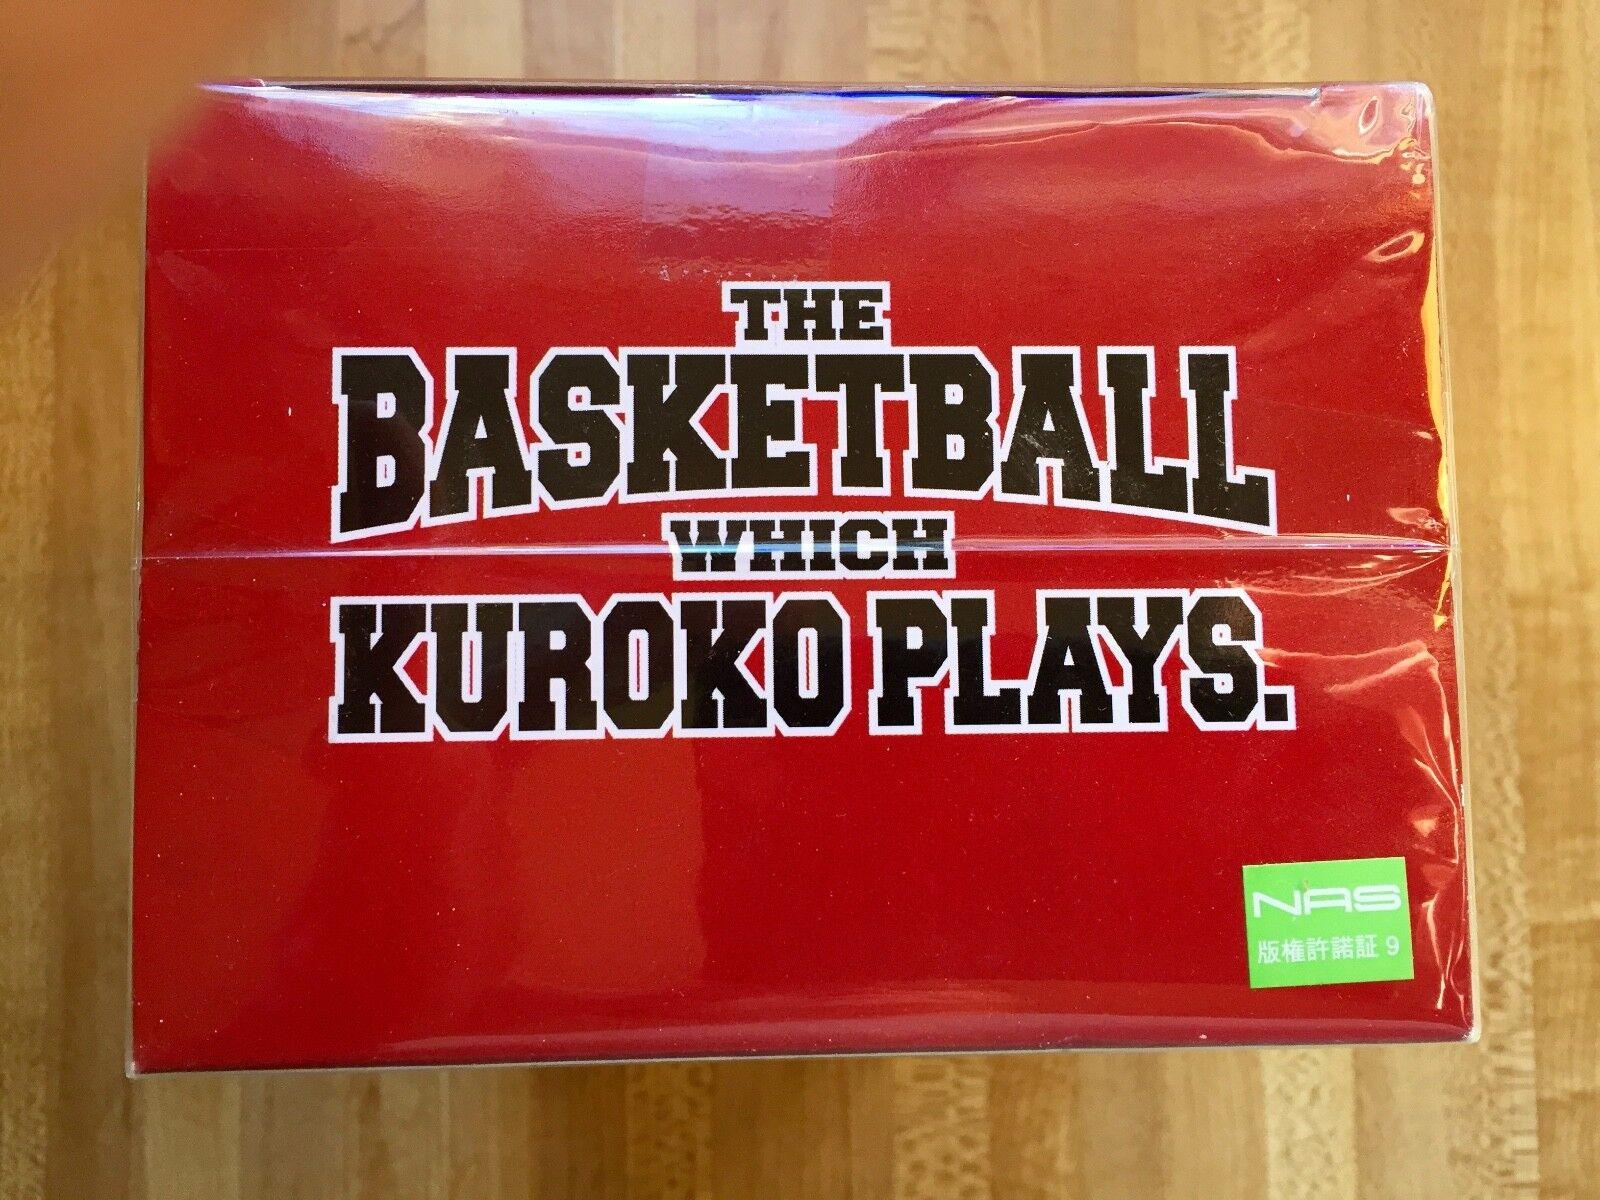 Basketball DXF Figurine Cross Cross Cross x Players Kuroko Taiga Kagami bd4ee0